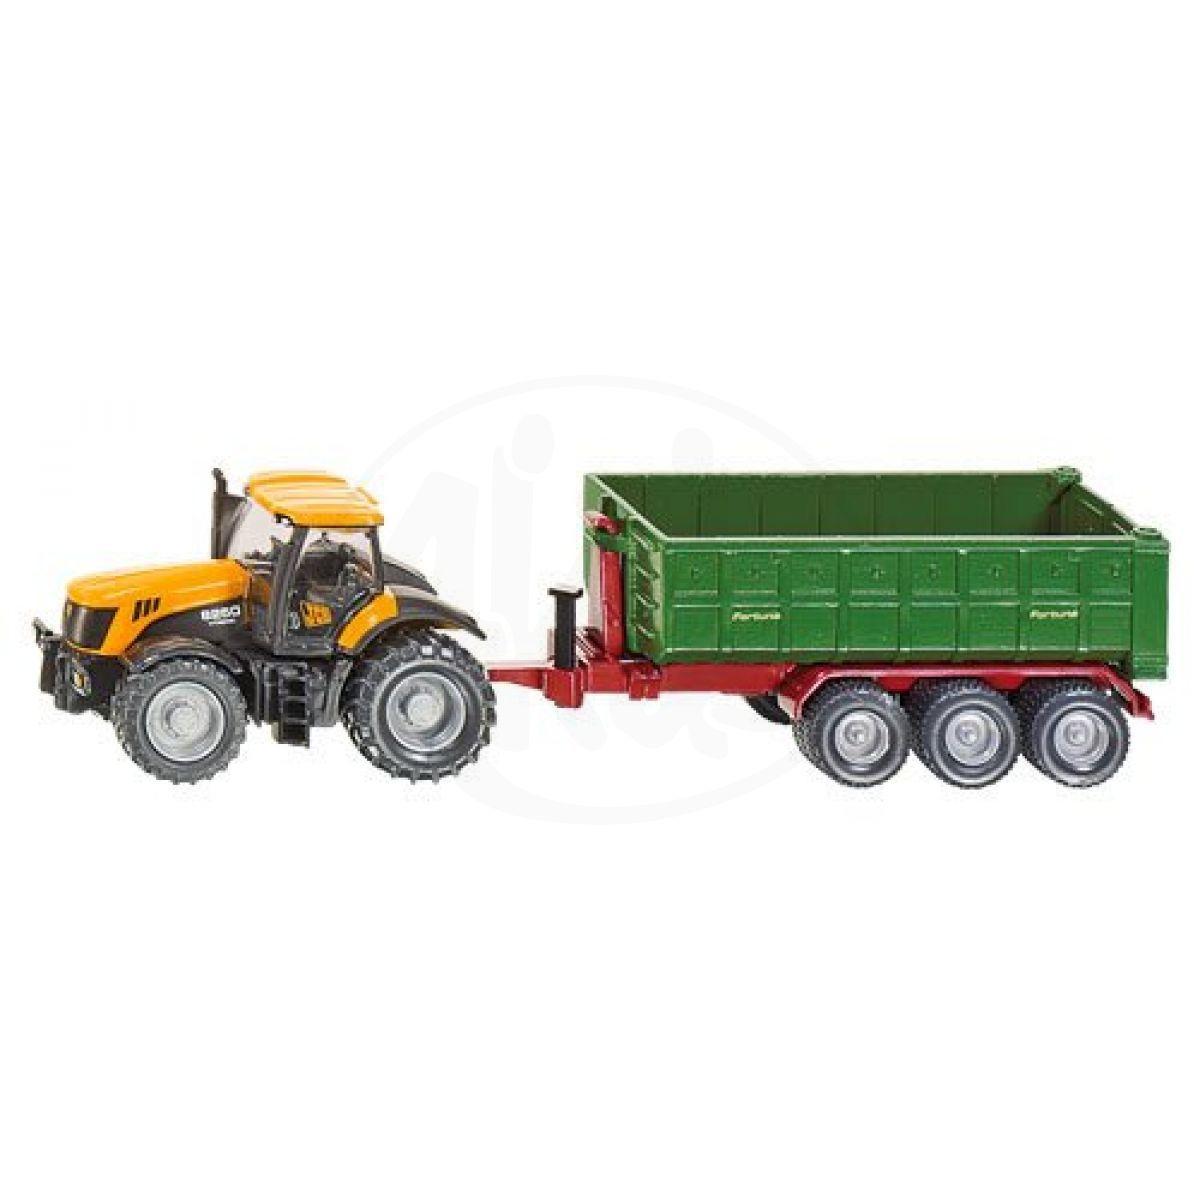 SIKU Farmer 1855 - Traktor JCB Fasttrac 8250 s kontejnerovým přívěsem